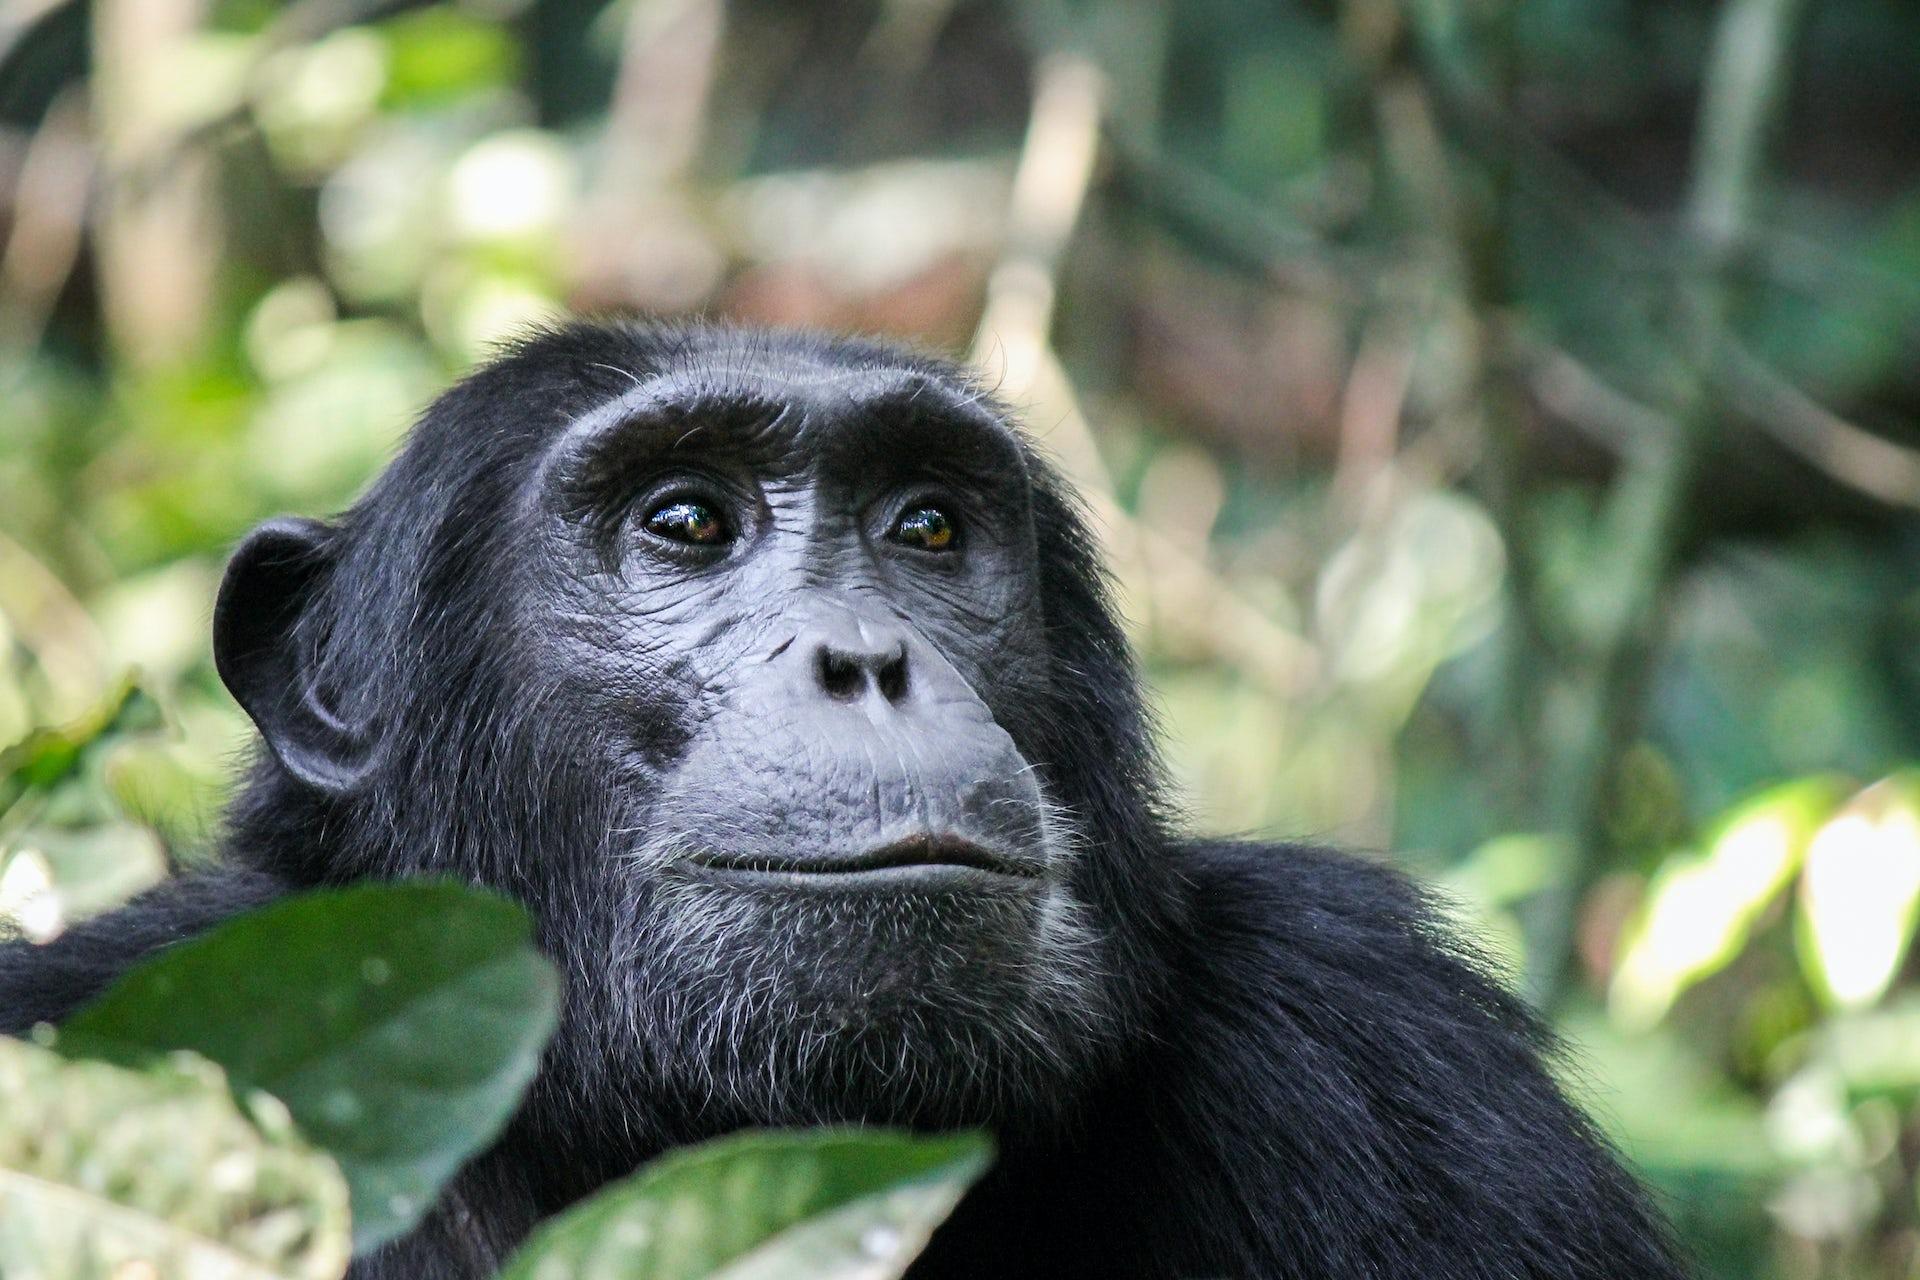 Human viruses threaten the future of Uganda's chimpanzees